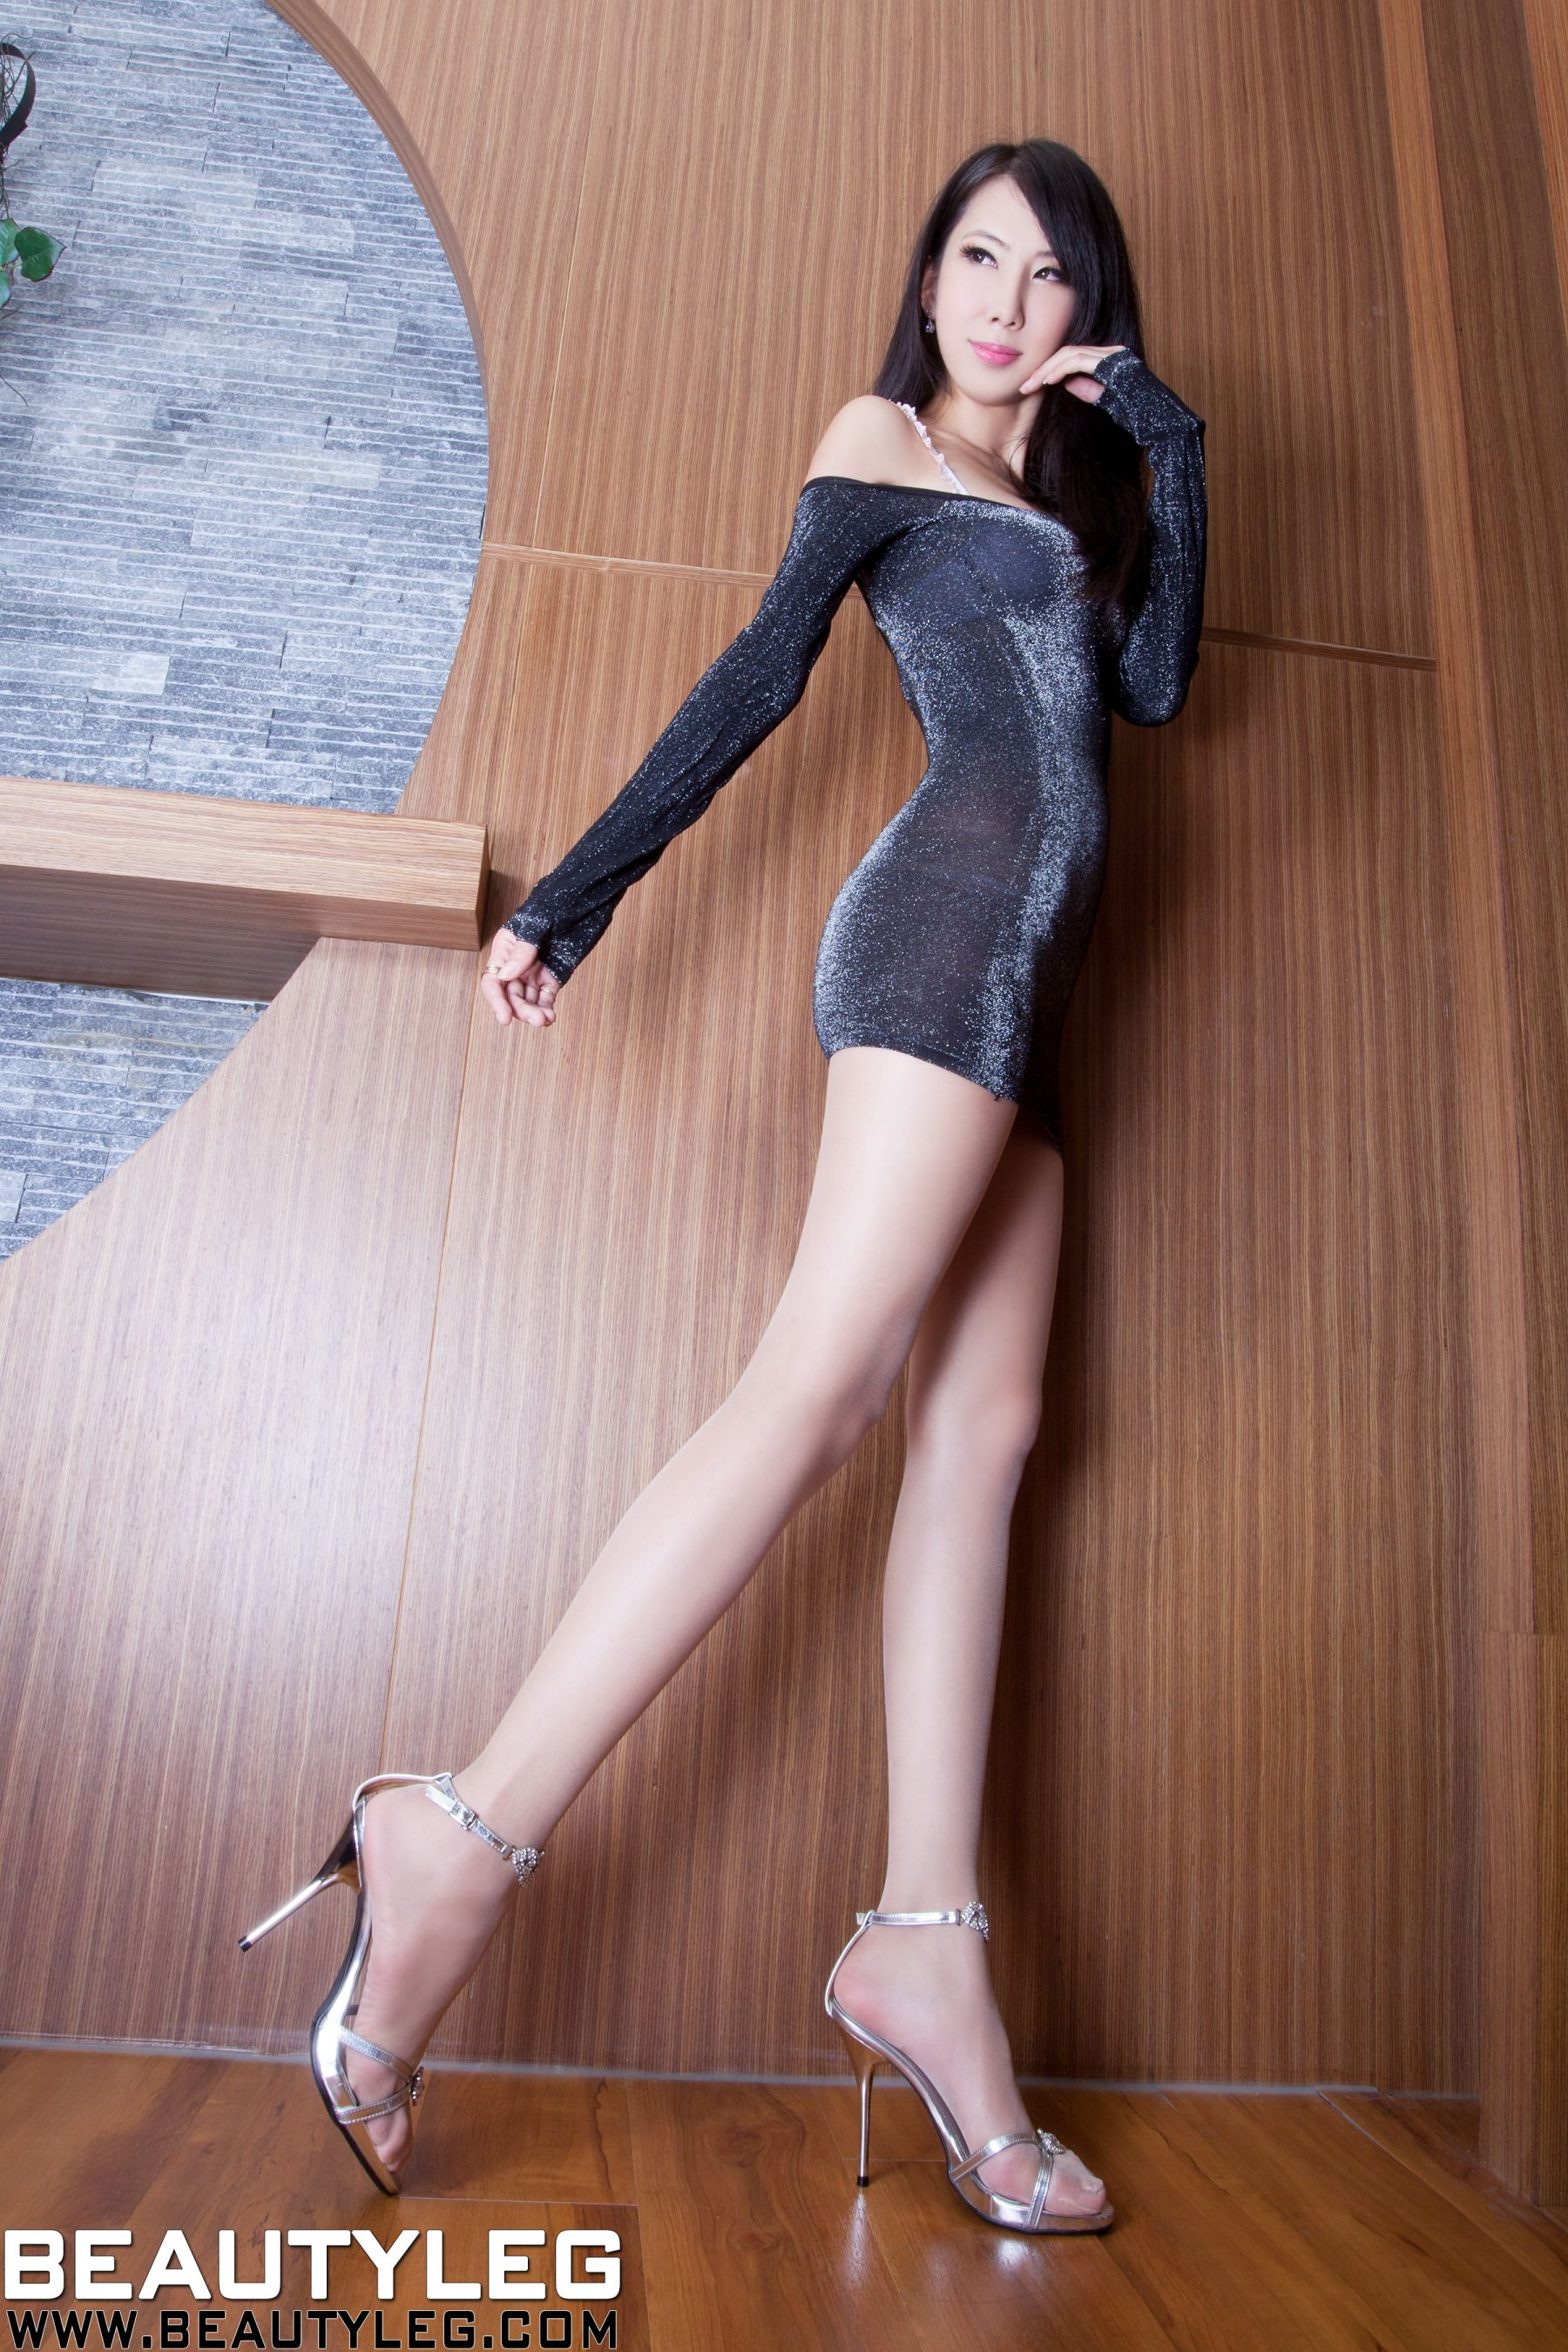 VOL.253 [Beautyleg]美腿高跟凉鞋:童采萱(Beautyleg Yoyo,腿模Yoyo)高品质写真套图(49P)